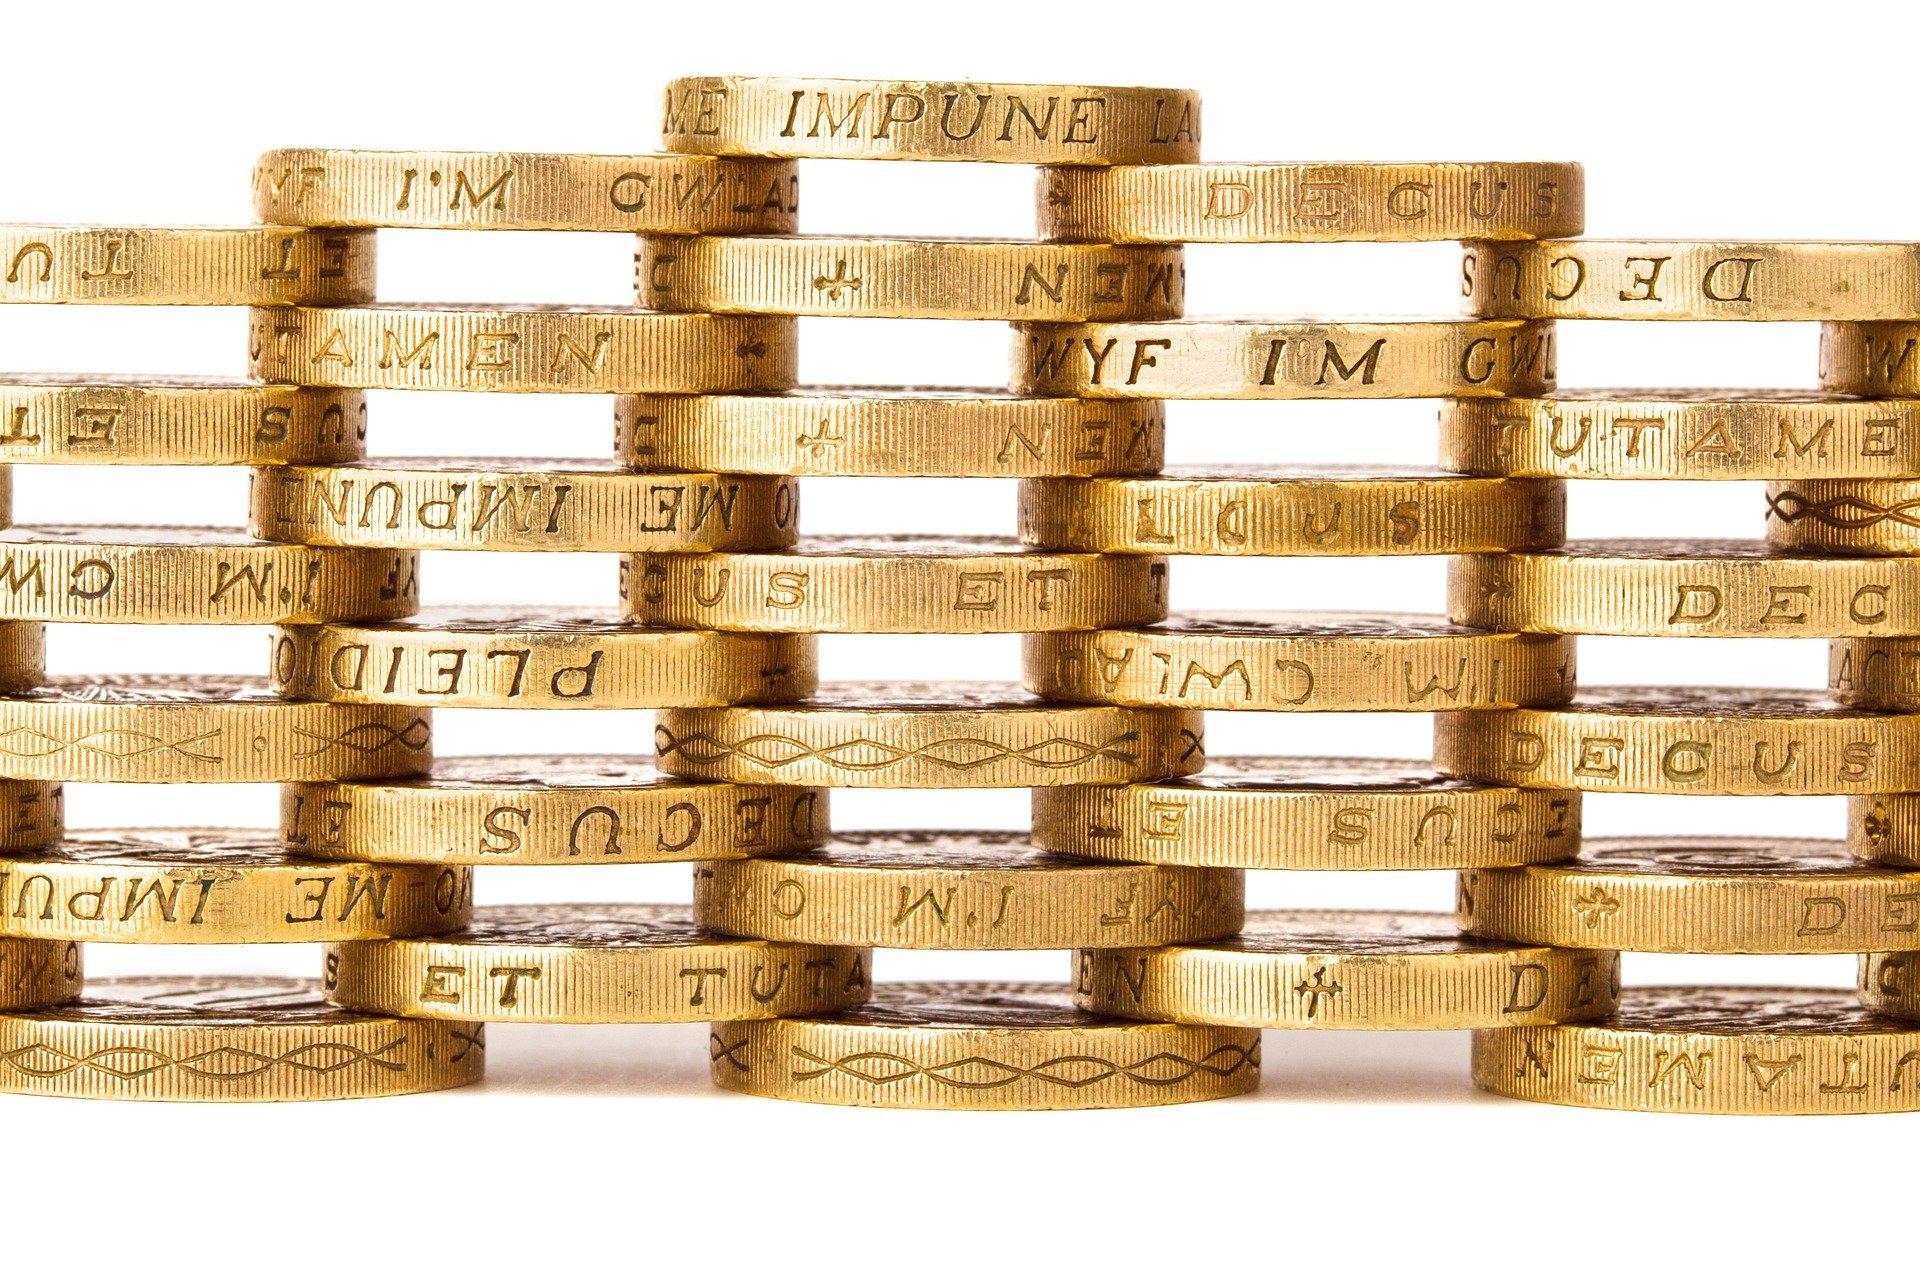 Lloyds overdraft fees